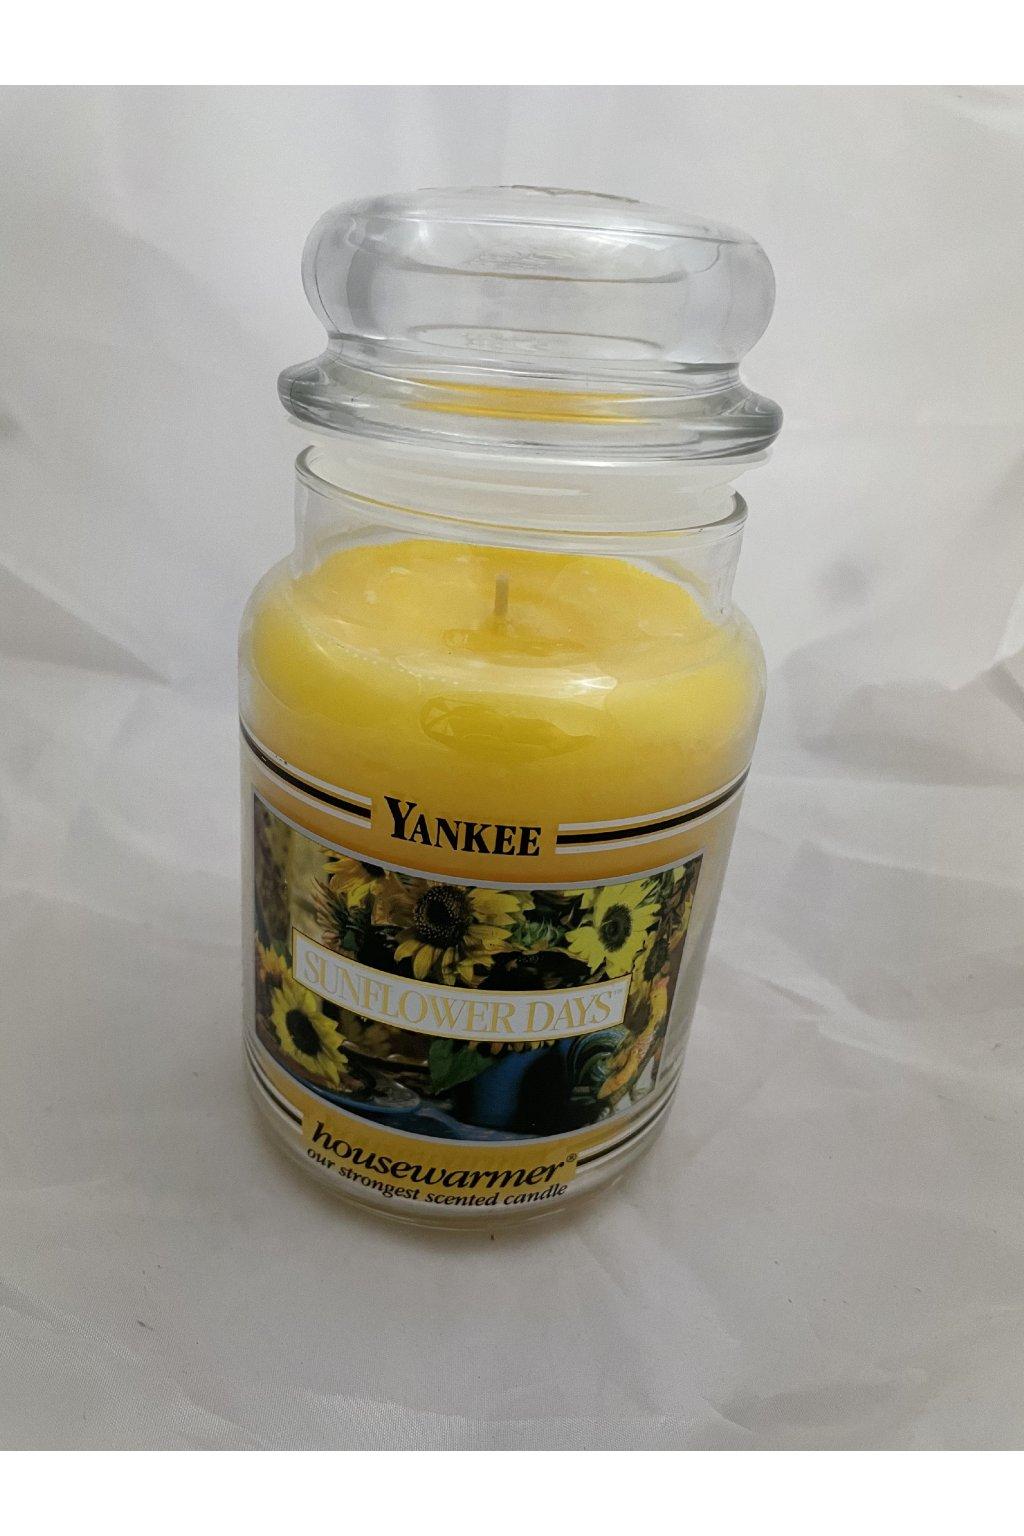 Yankee Candle Sunflower days 623g BLACK BAND